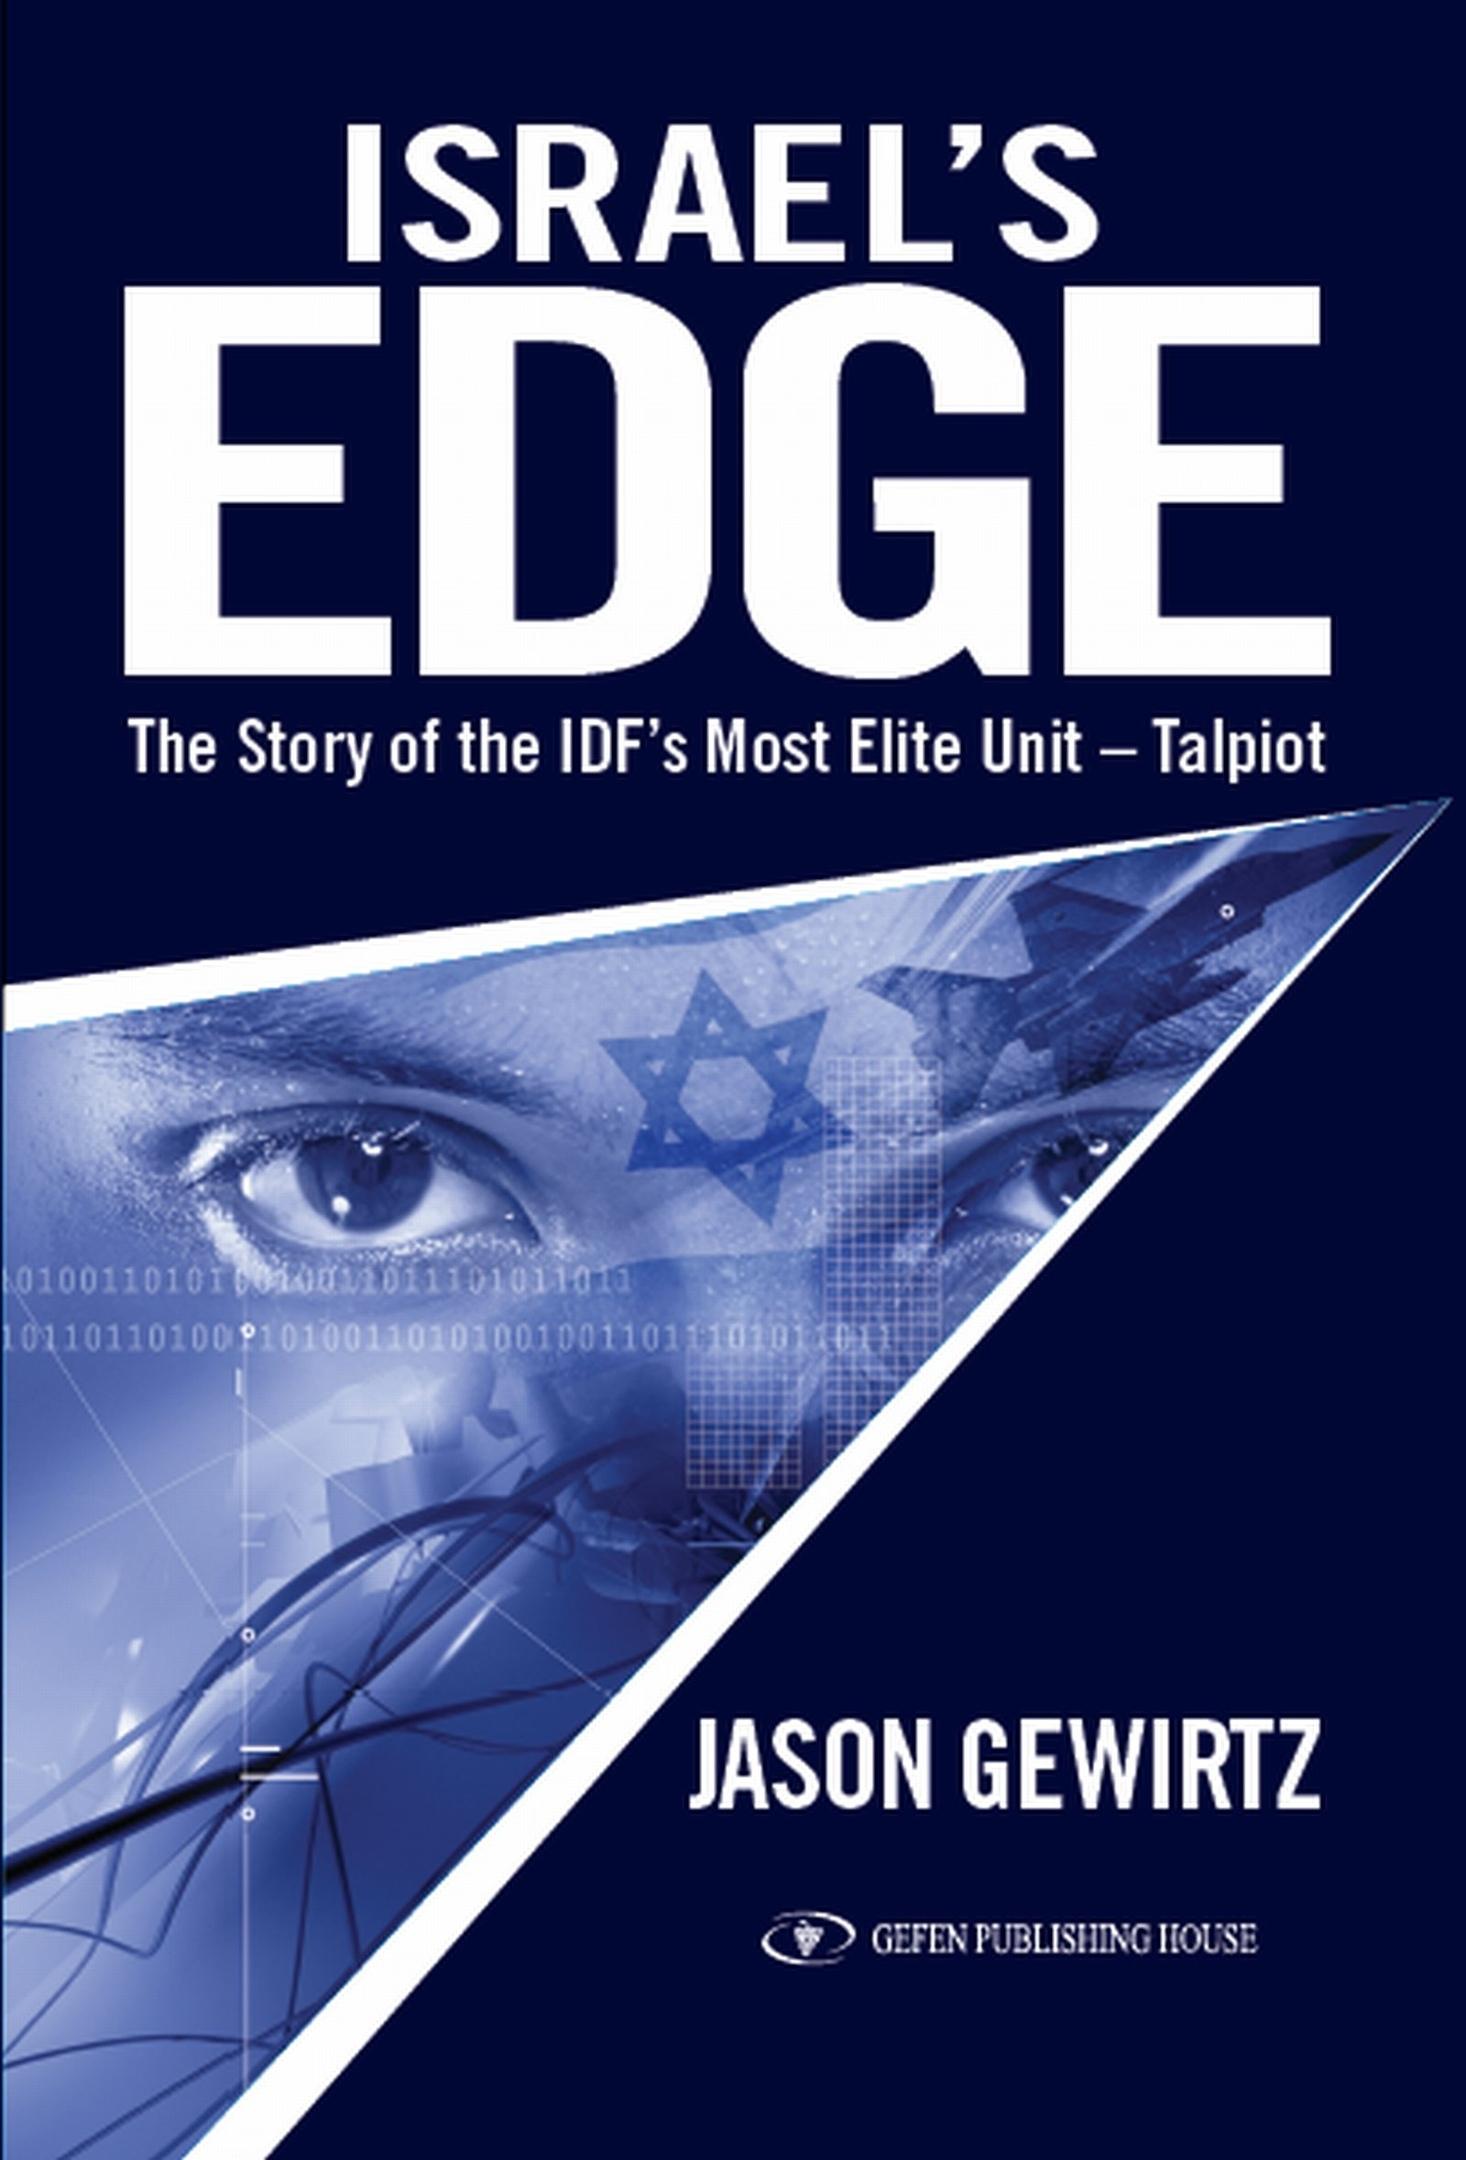 Jason Gewirtz – Israel's Edge